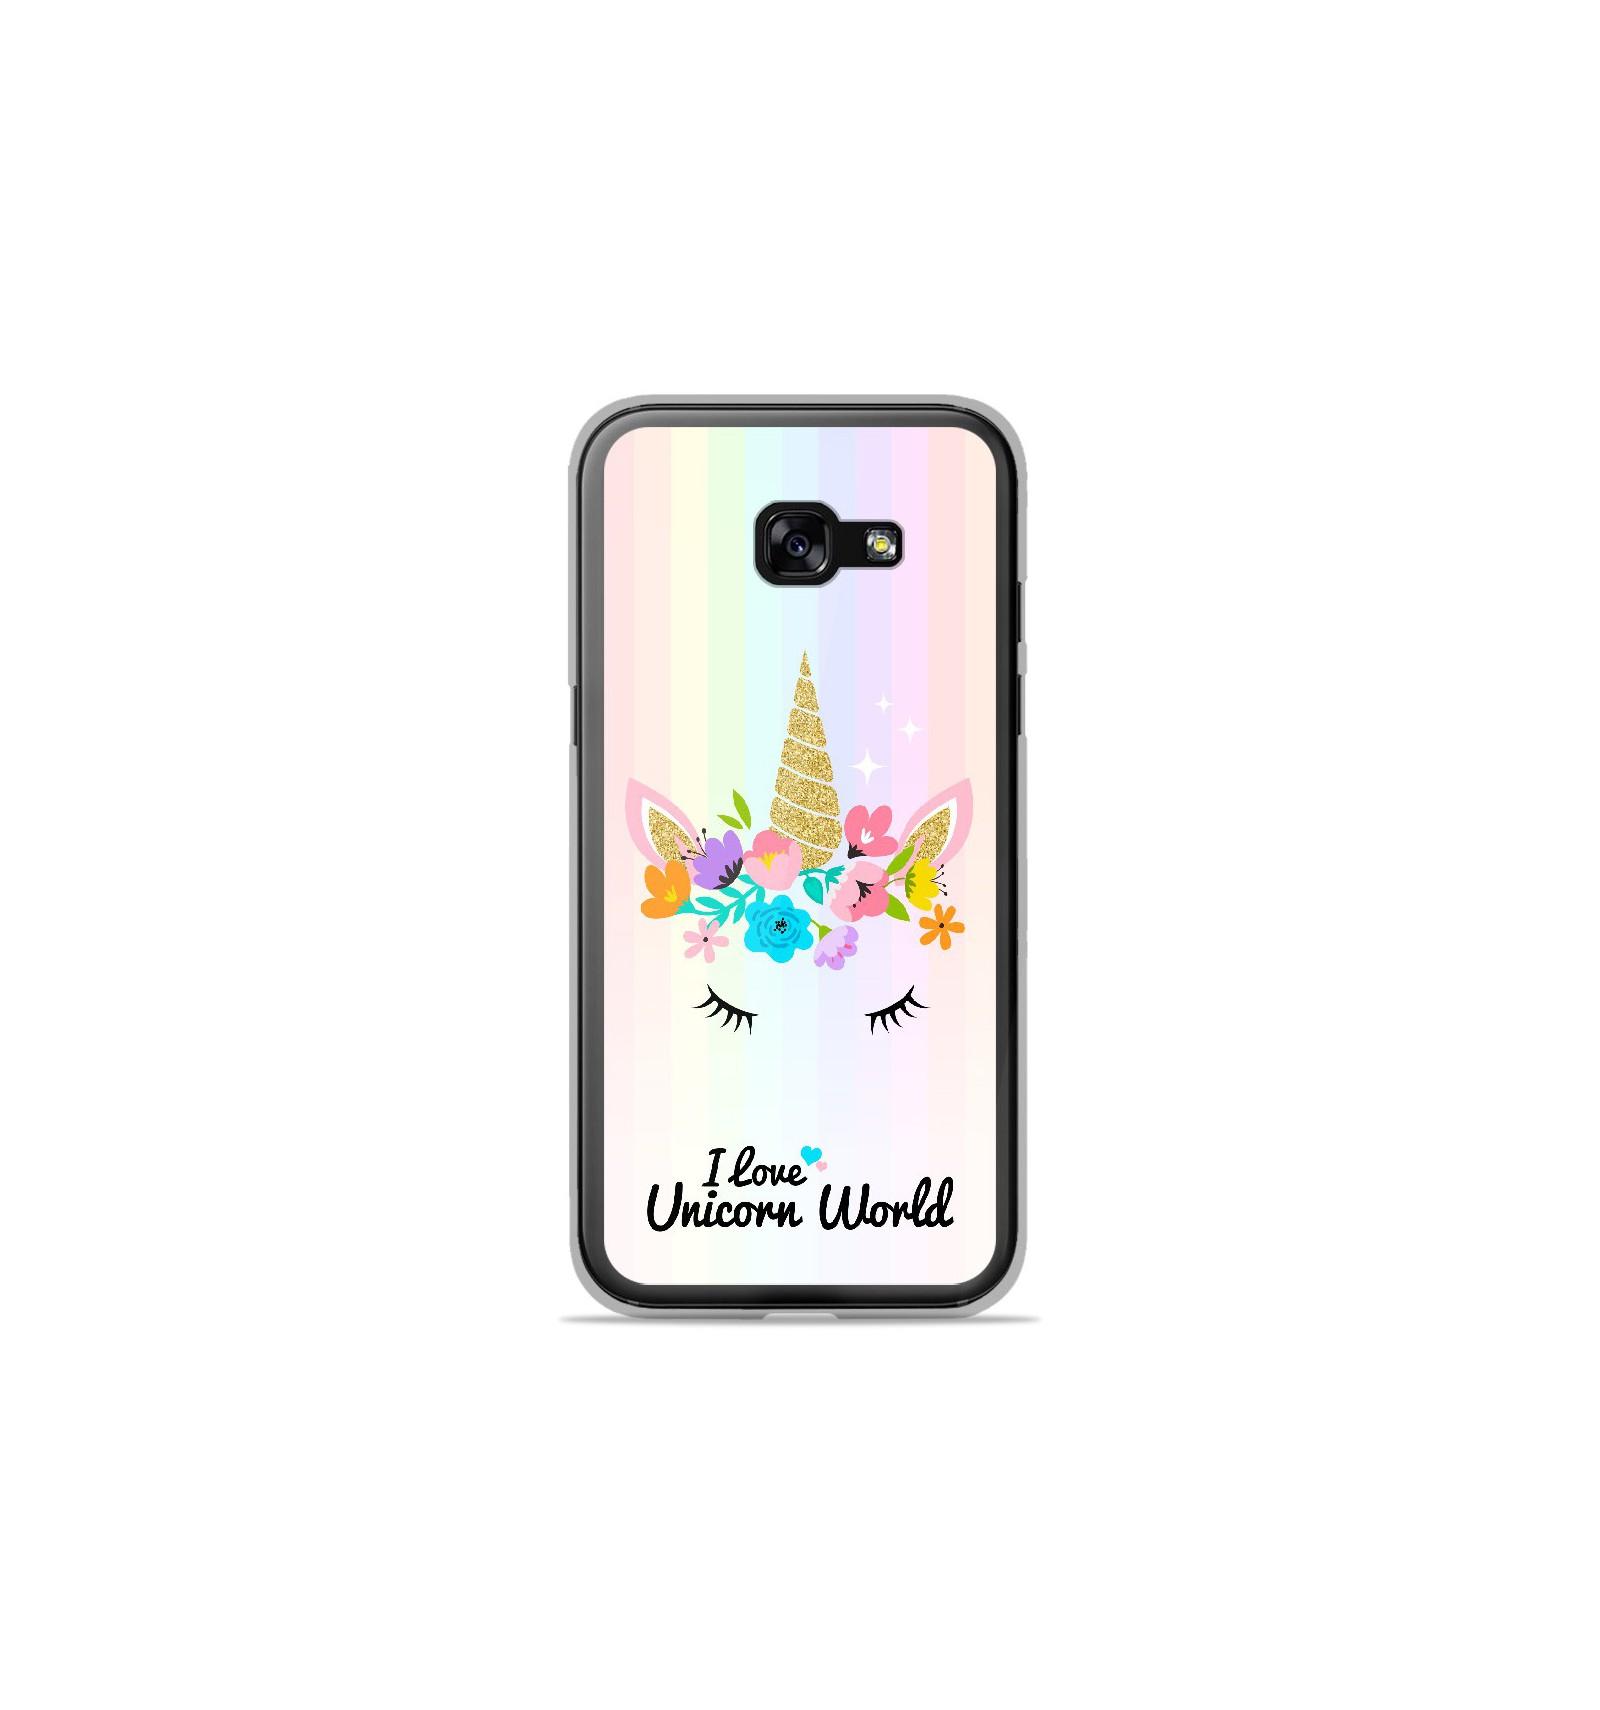 Coque en silicone Samsung Galaxy A3 2017 - Unicorn World